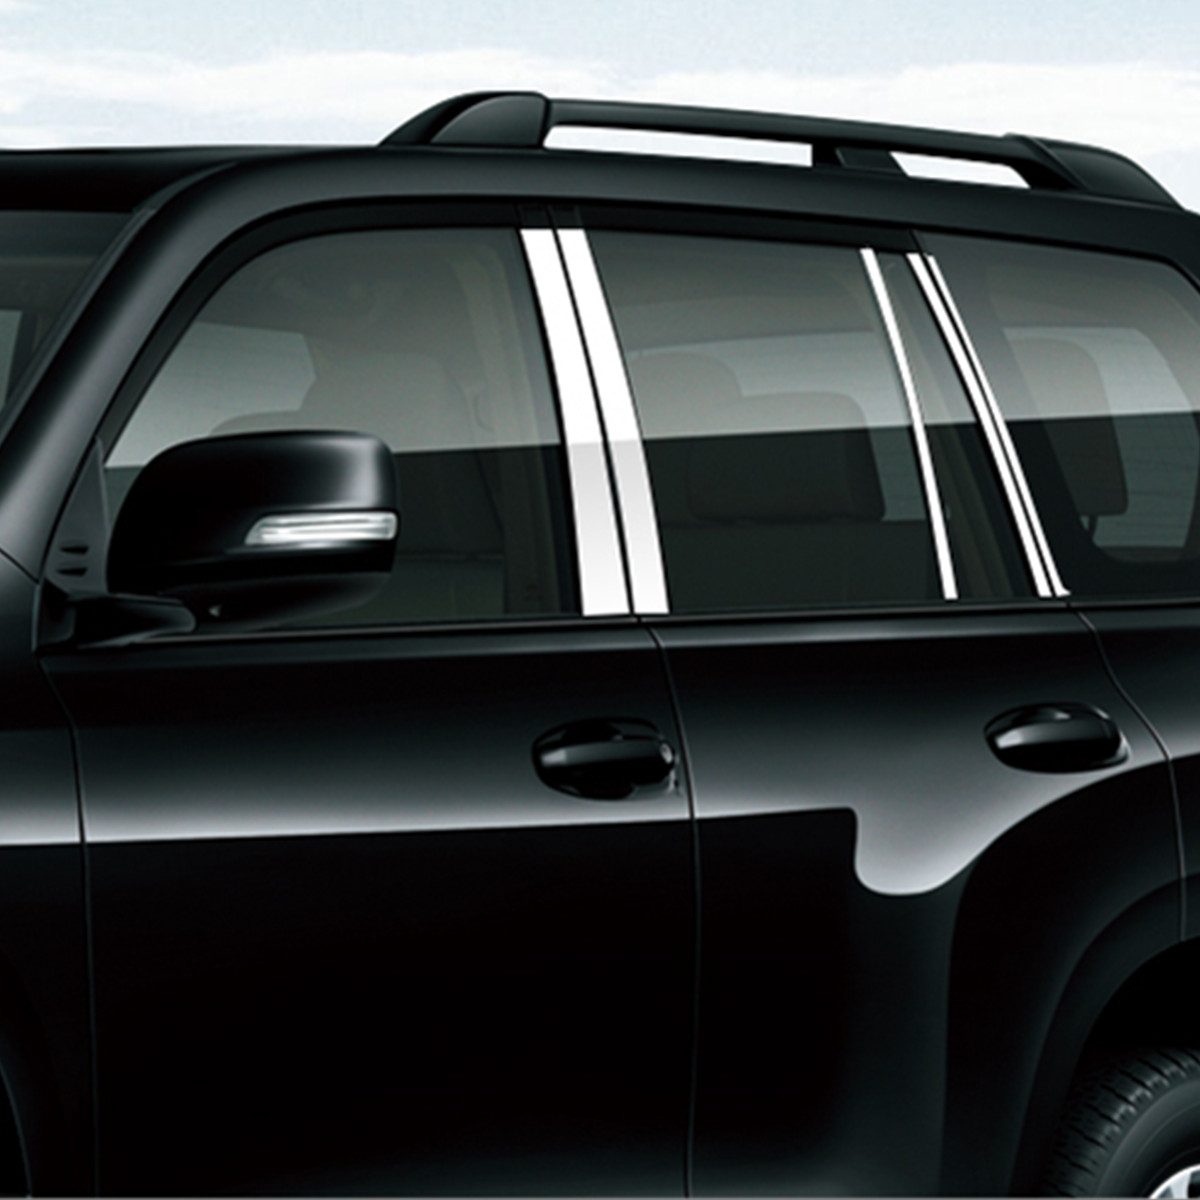 Accessories 10PCS/set Stainless Steel Window Column Strip For Toyota Land Cruiser Prado 120 2003 2004 2005 2006 2007 2008 2009